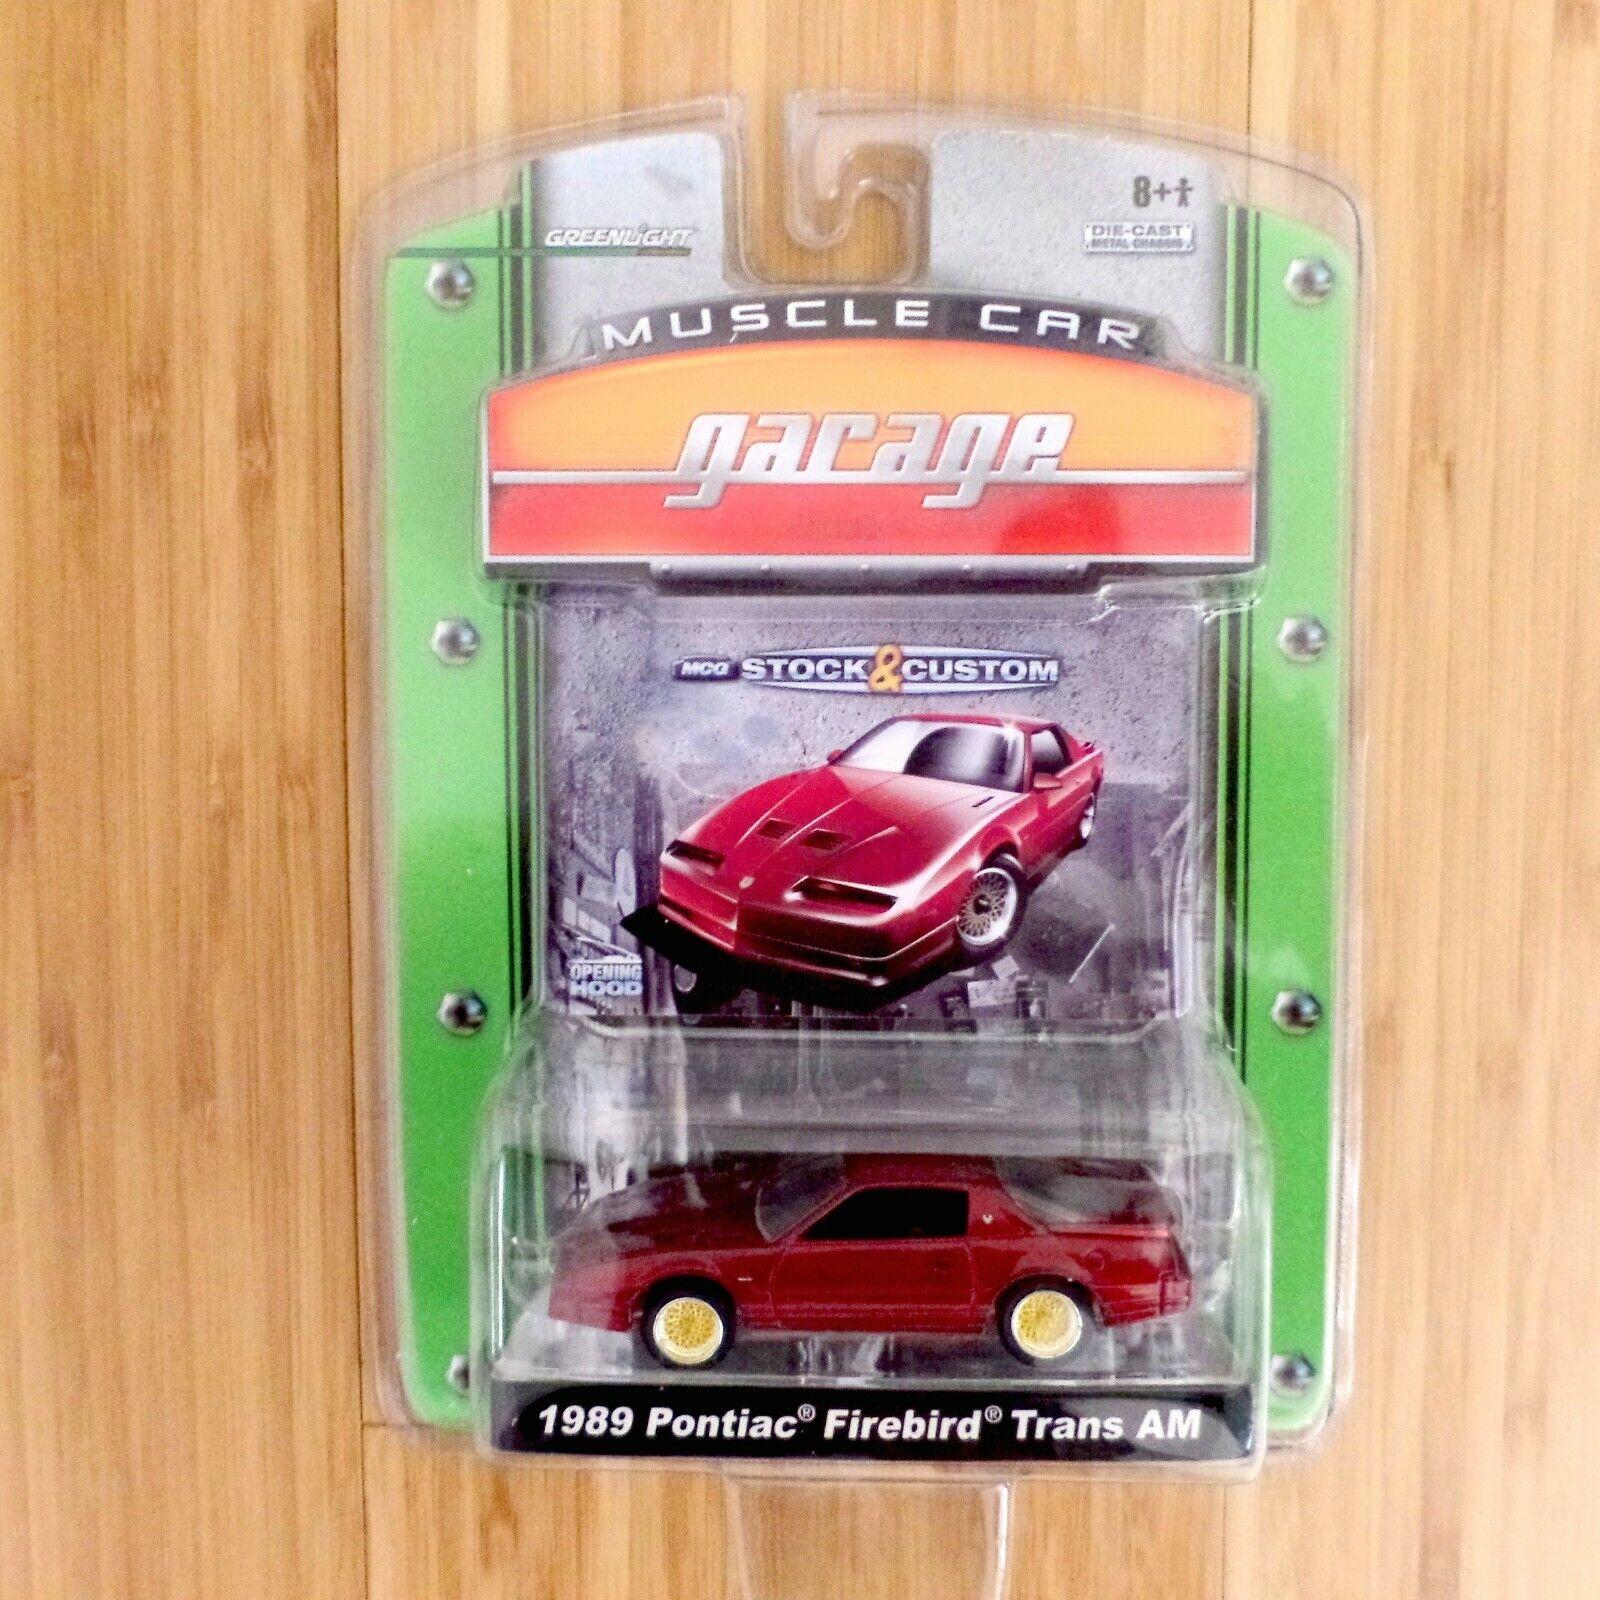 1989 Pontiac Firebird TransAm verdelight Muscle auto Garage nuovo SealedCollectible